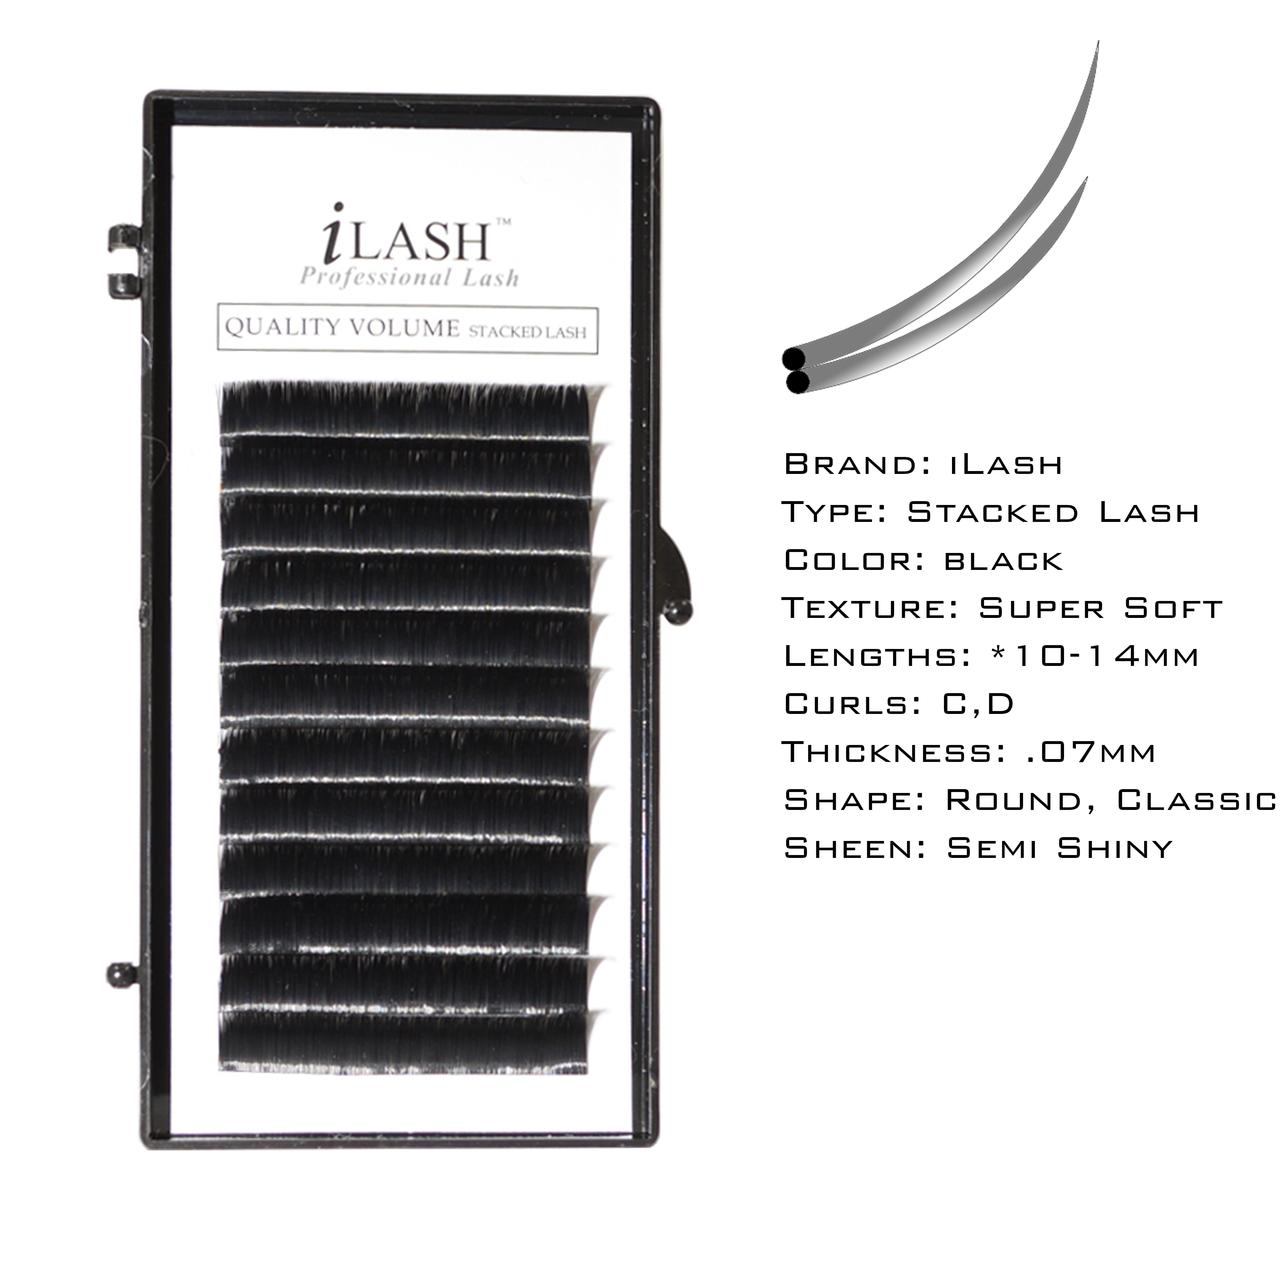 c484e59b2be iLash Stacked Lash - Individual Length Tray - iLashstore.com